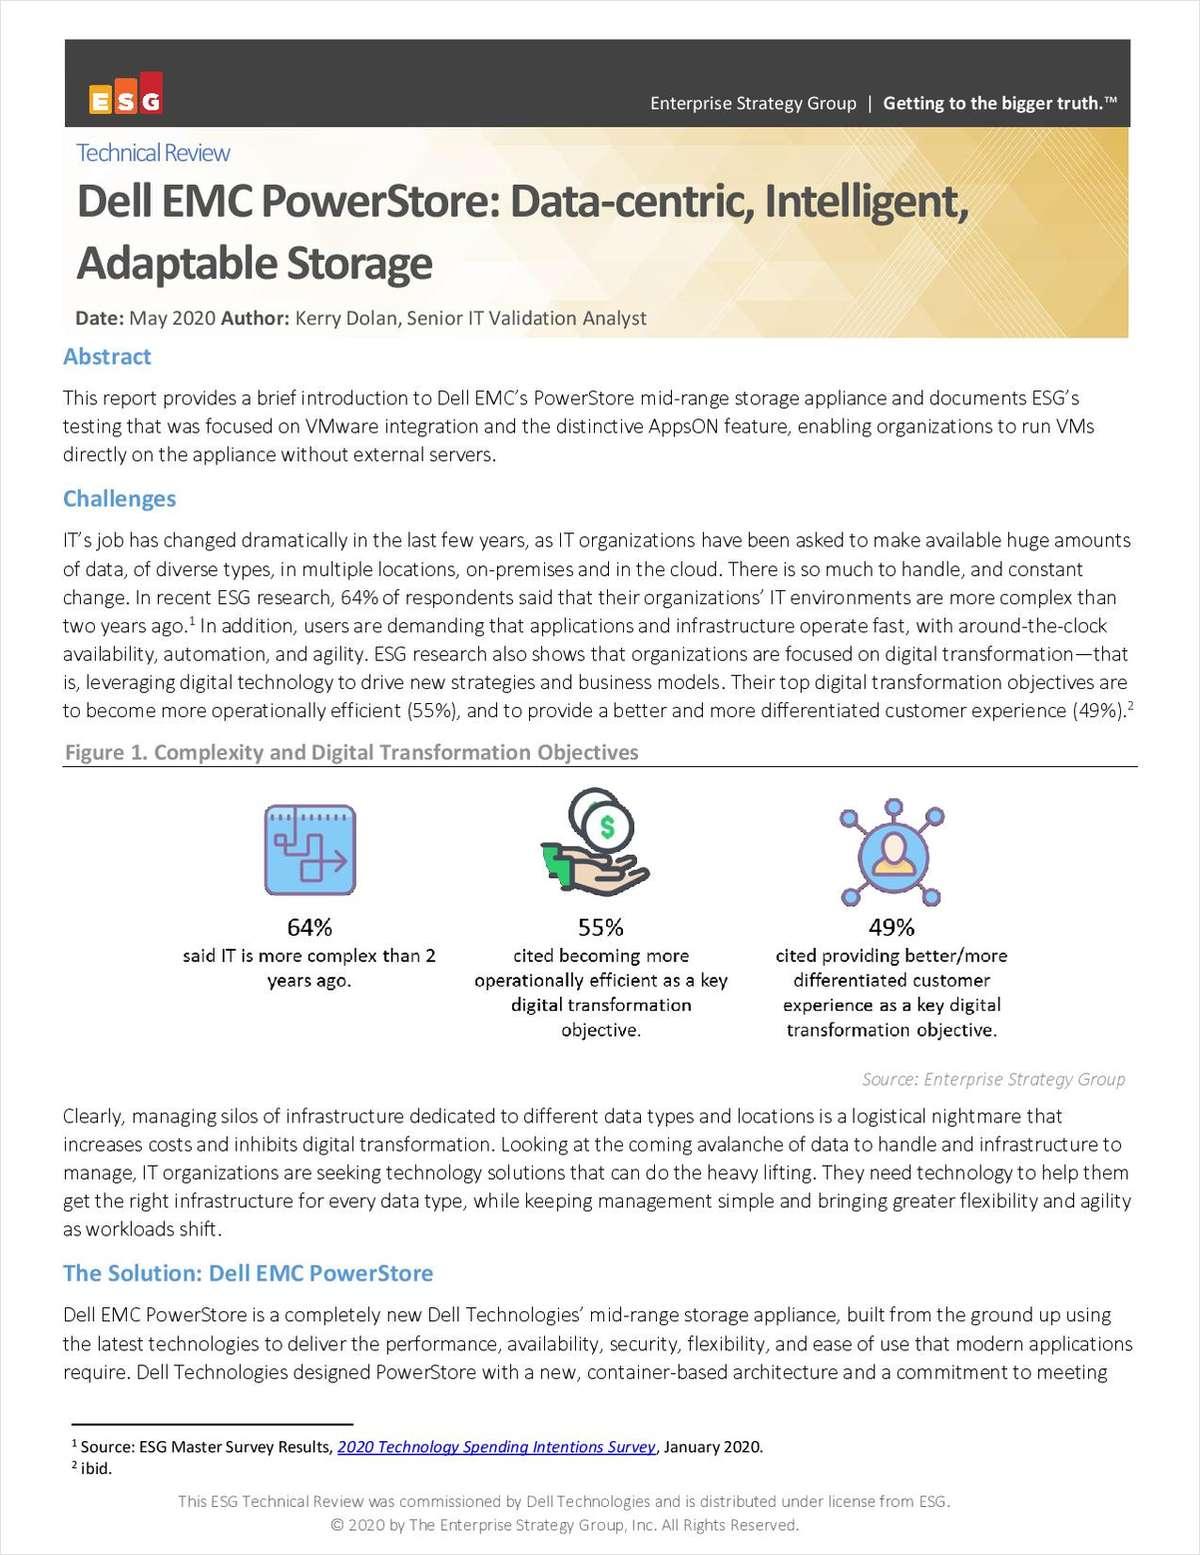 Dell EMC PowerStore: Data-centric, Intelligent, Adaptable Storage